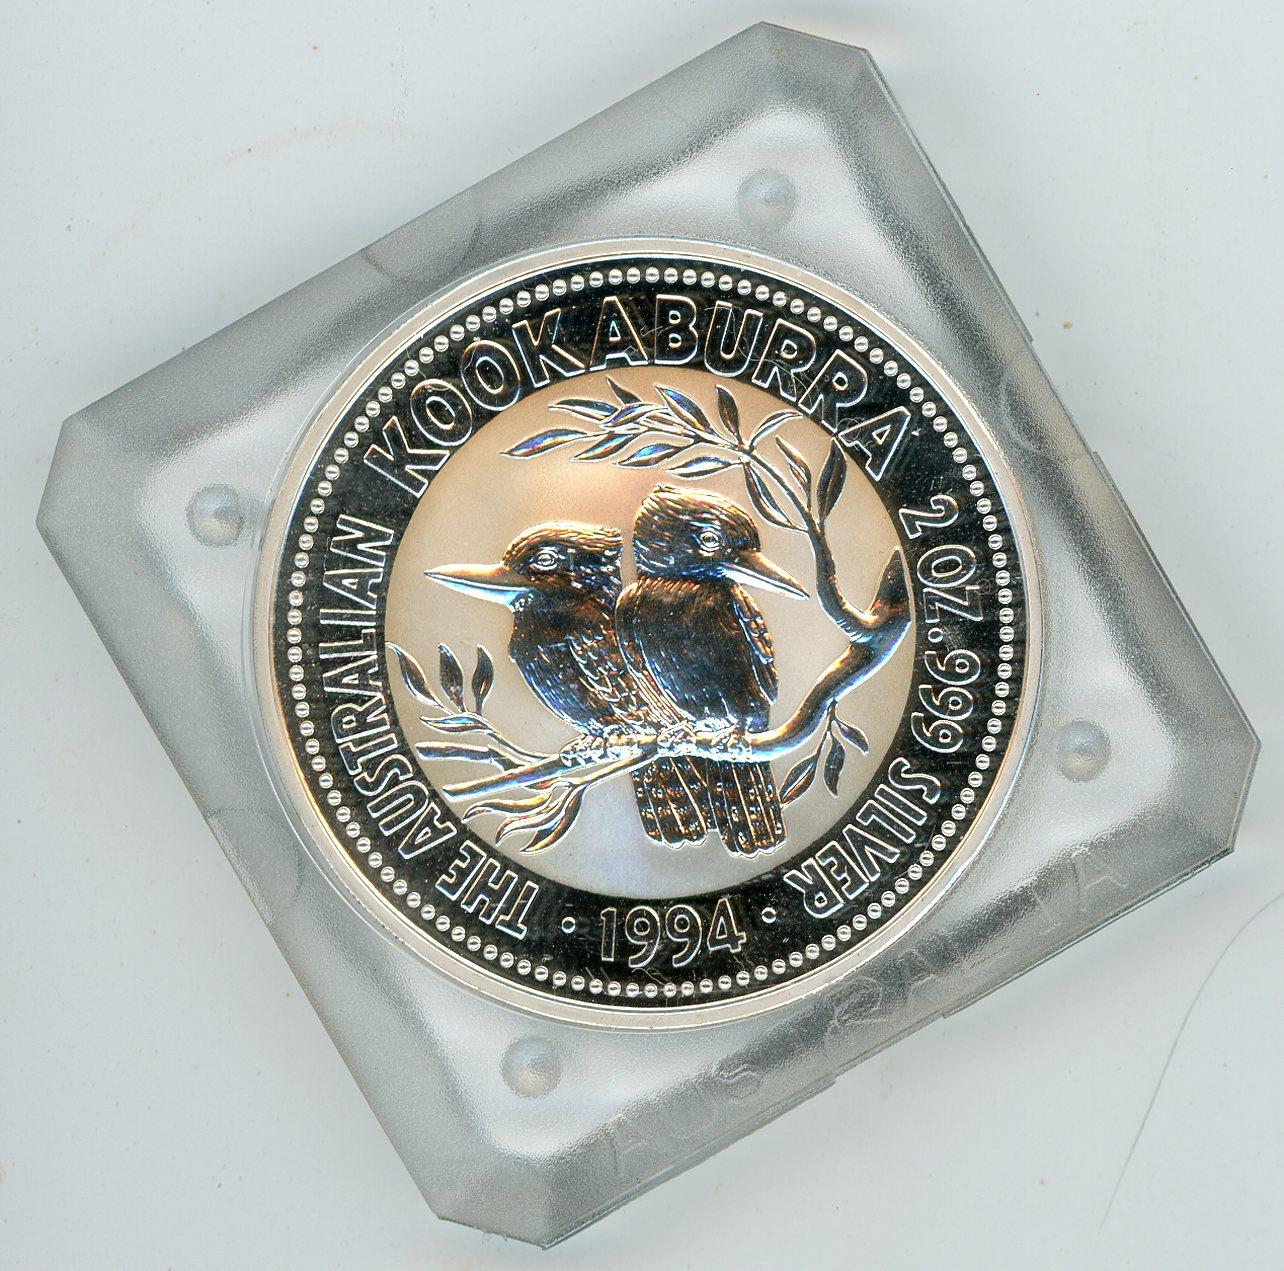 Thumbnail for 1994 2oz Silver Kookaburra In Capsule